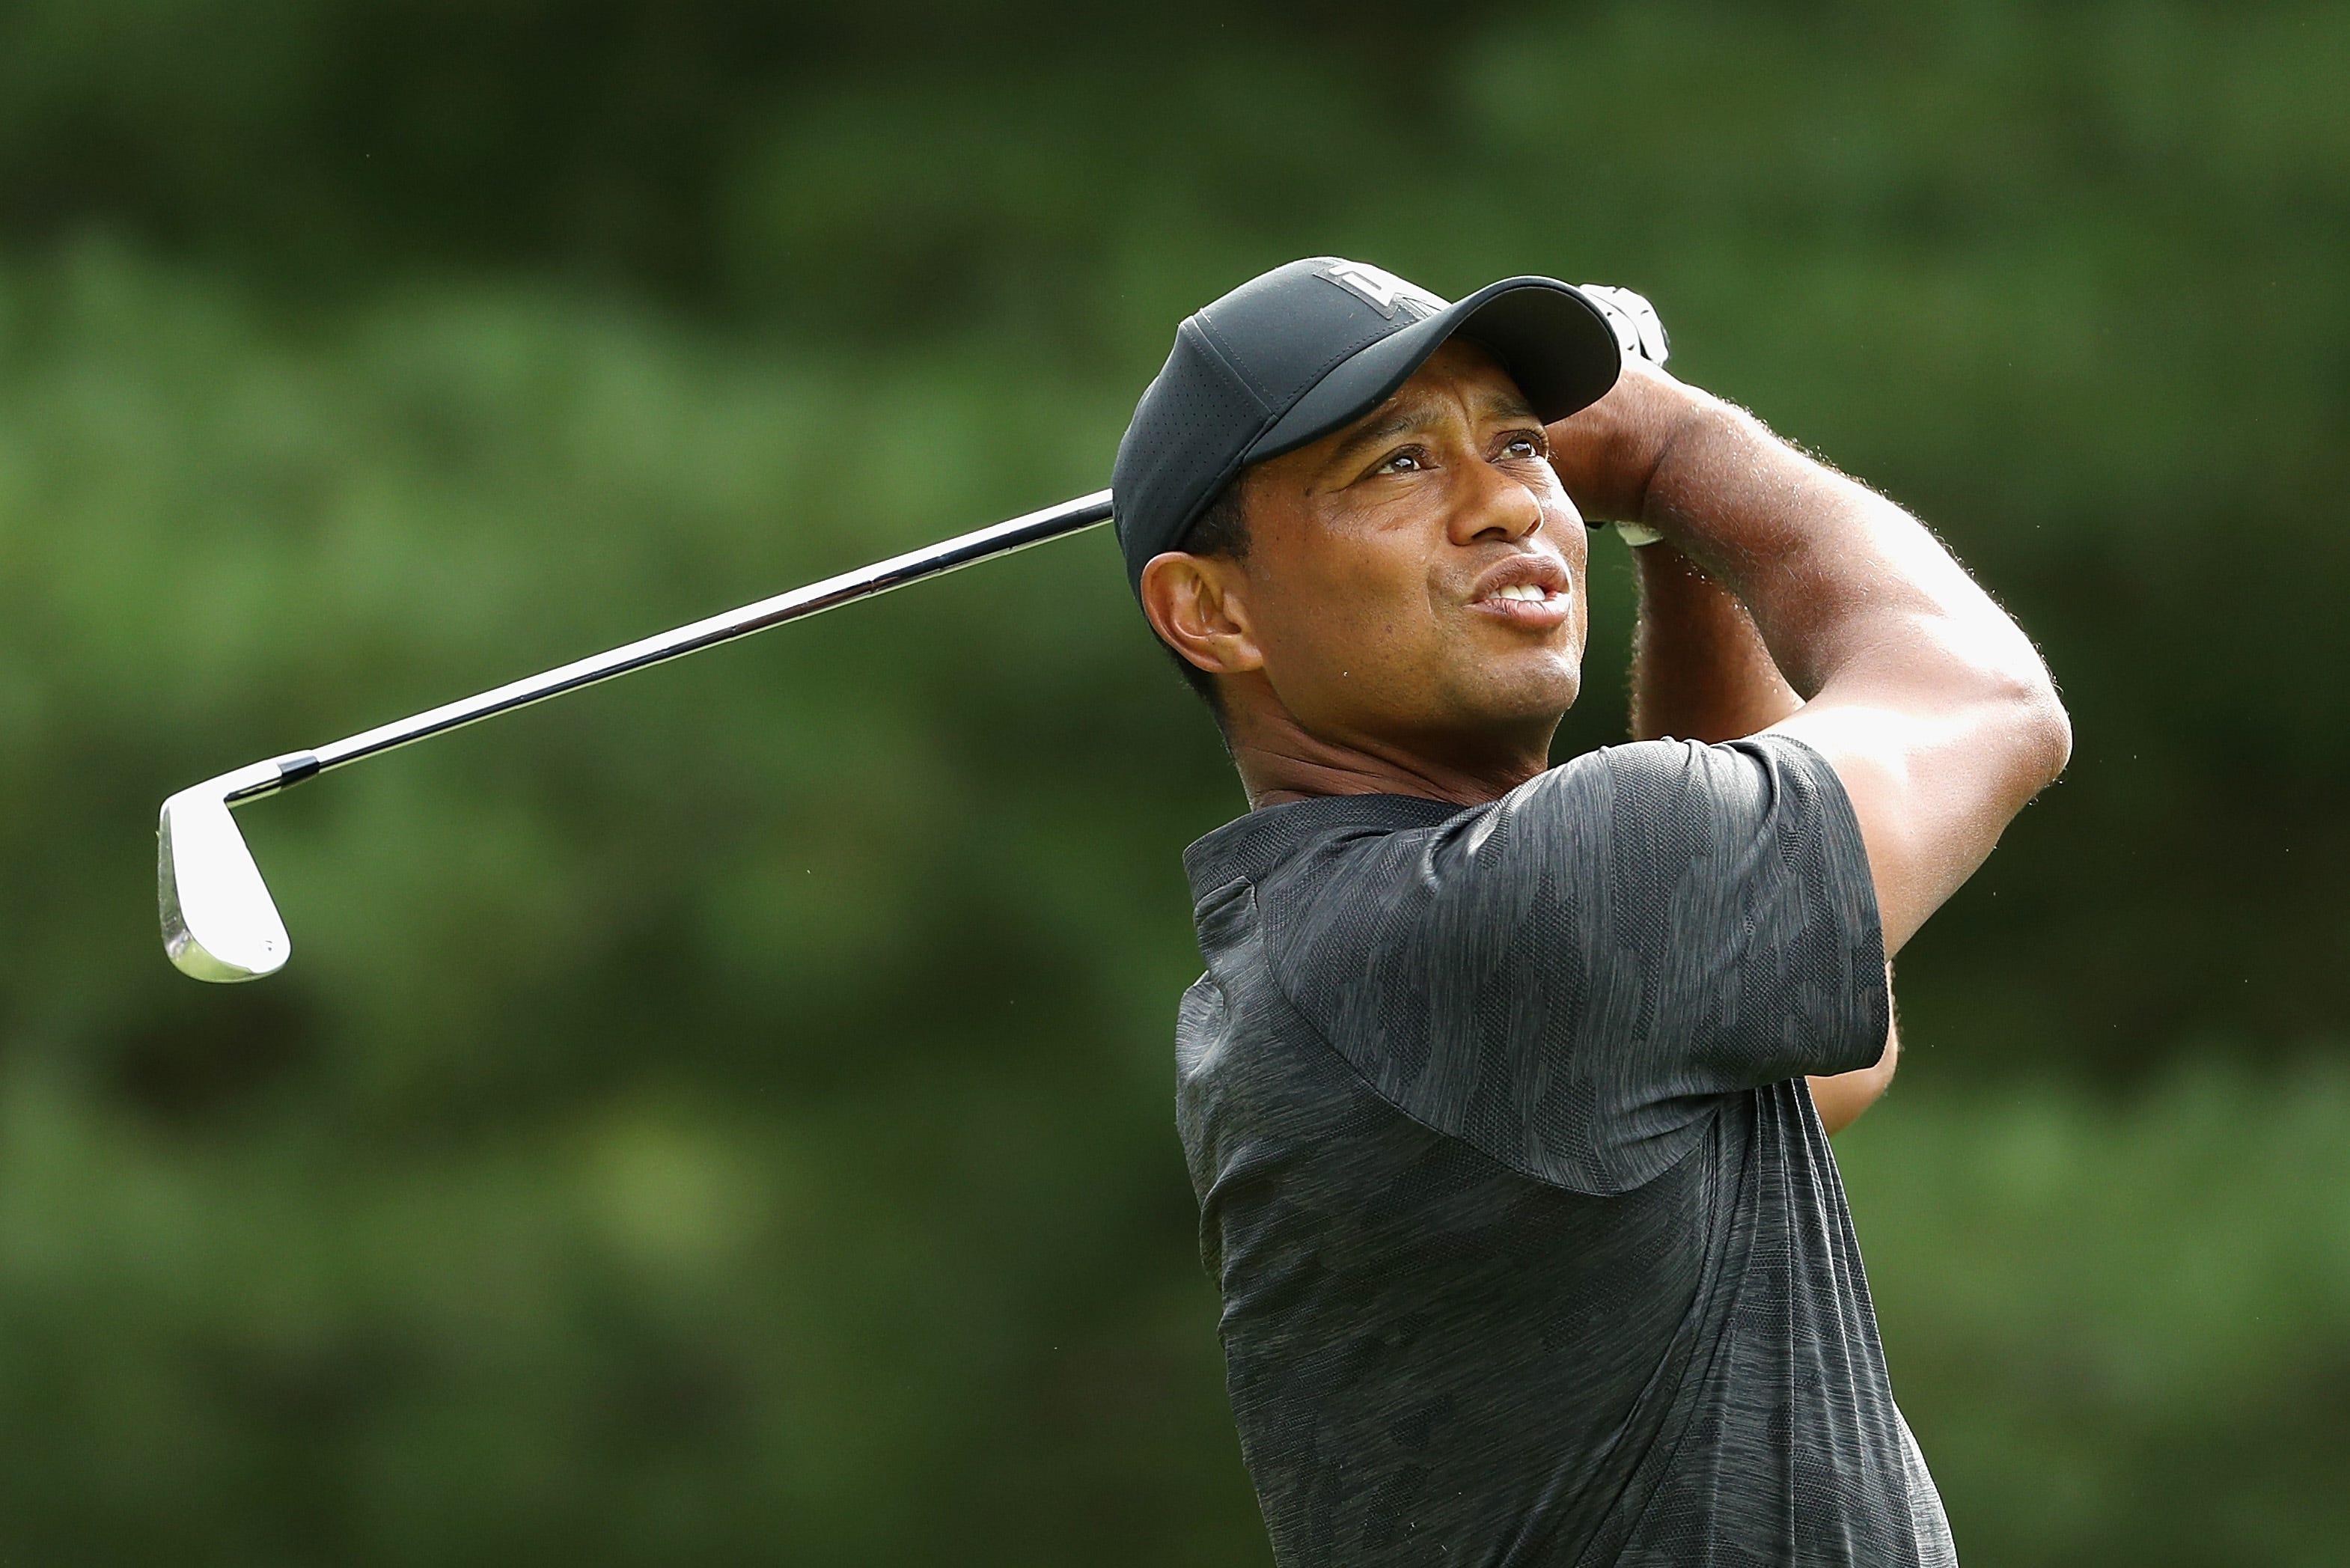 flirting moves that work golf swing sets free crossword